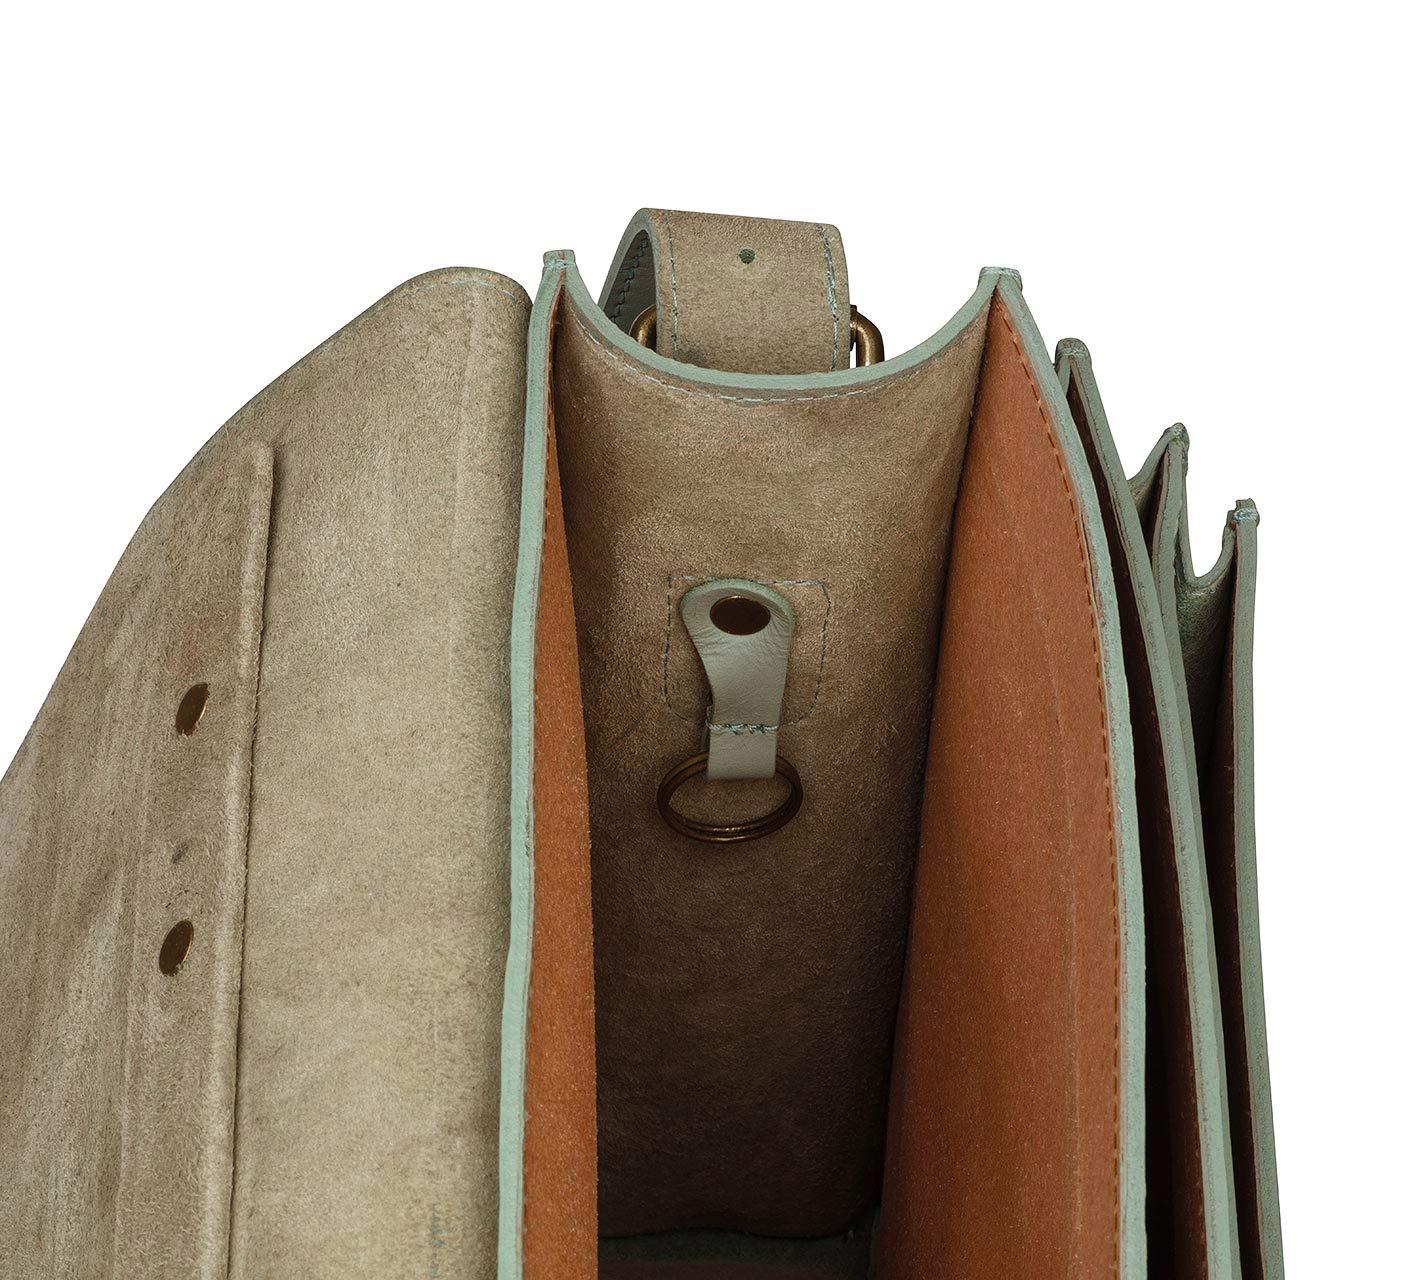 Schoolmaster modern Classic Umh/ängetasche f/ür Damen Berry Moderne Lehrertasche /& Aktentasche aus echtem Leder viele Innenf/ächer